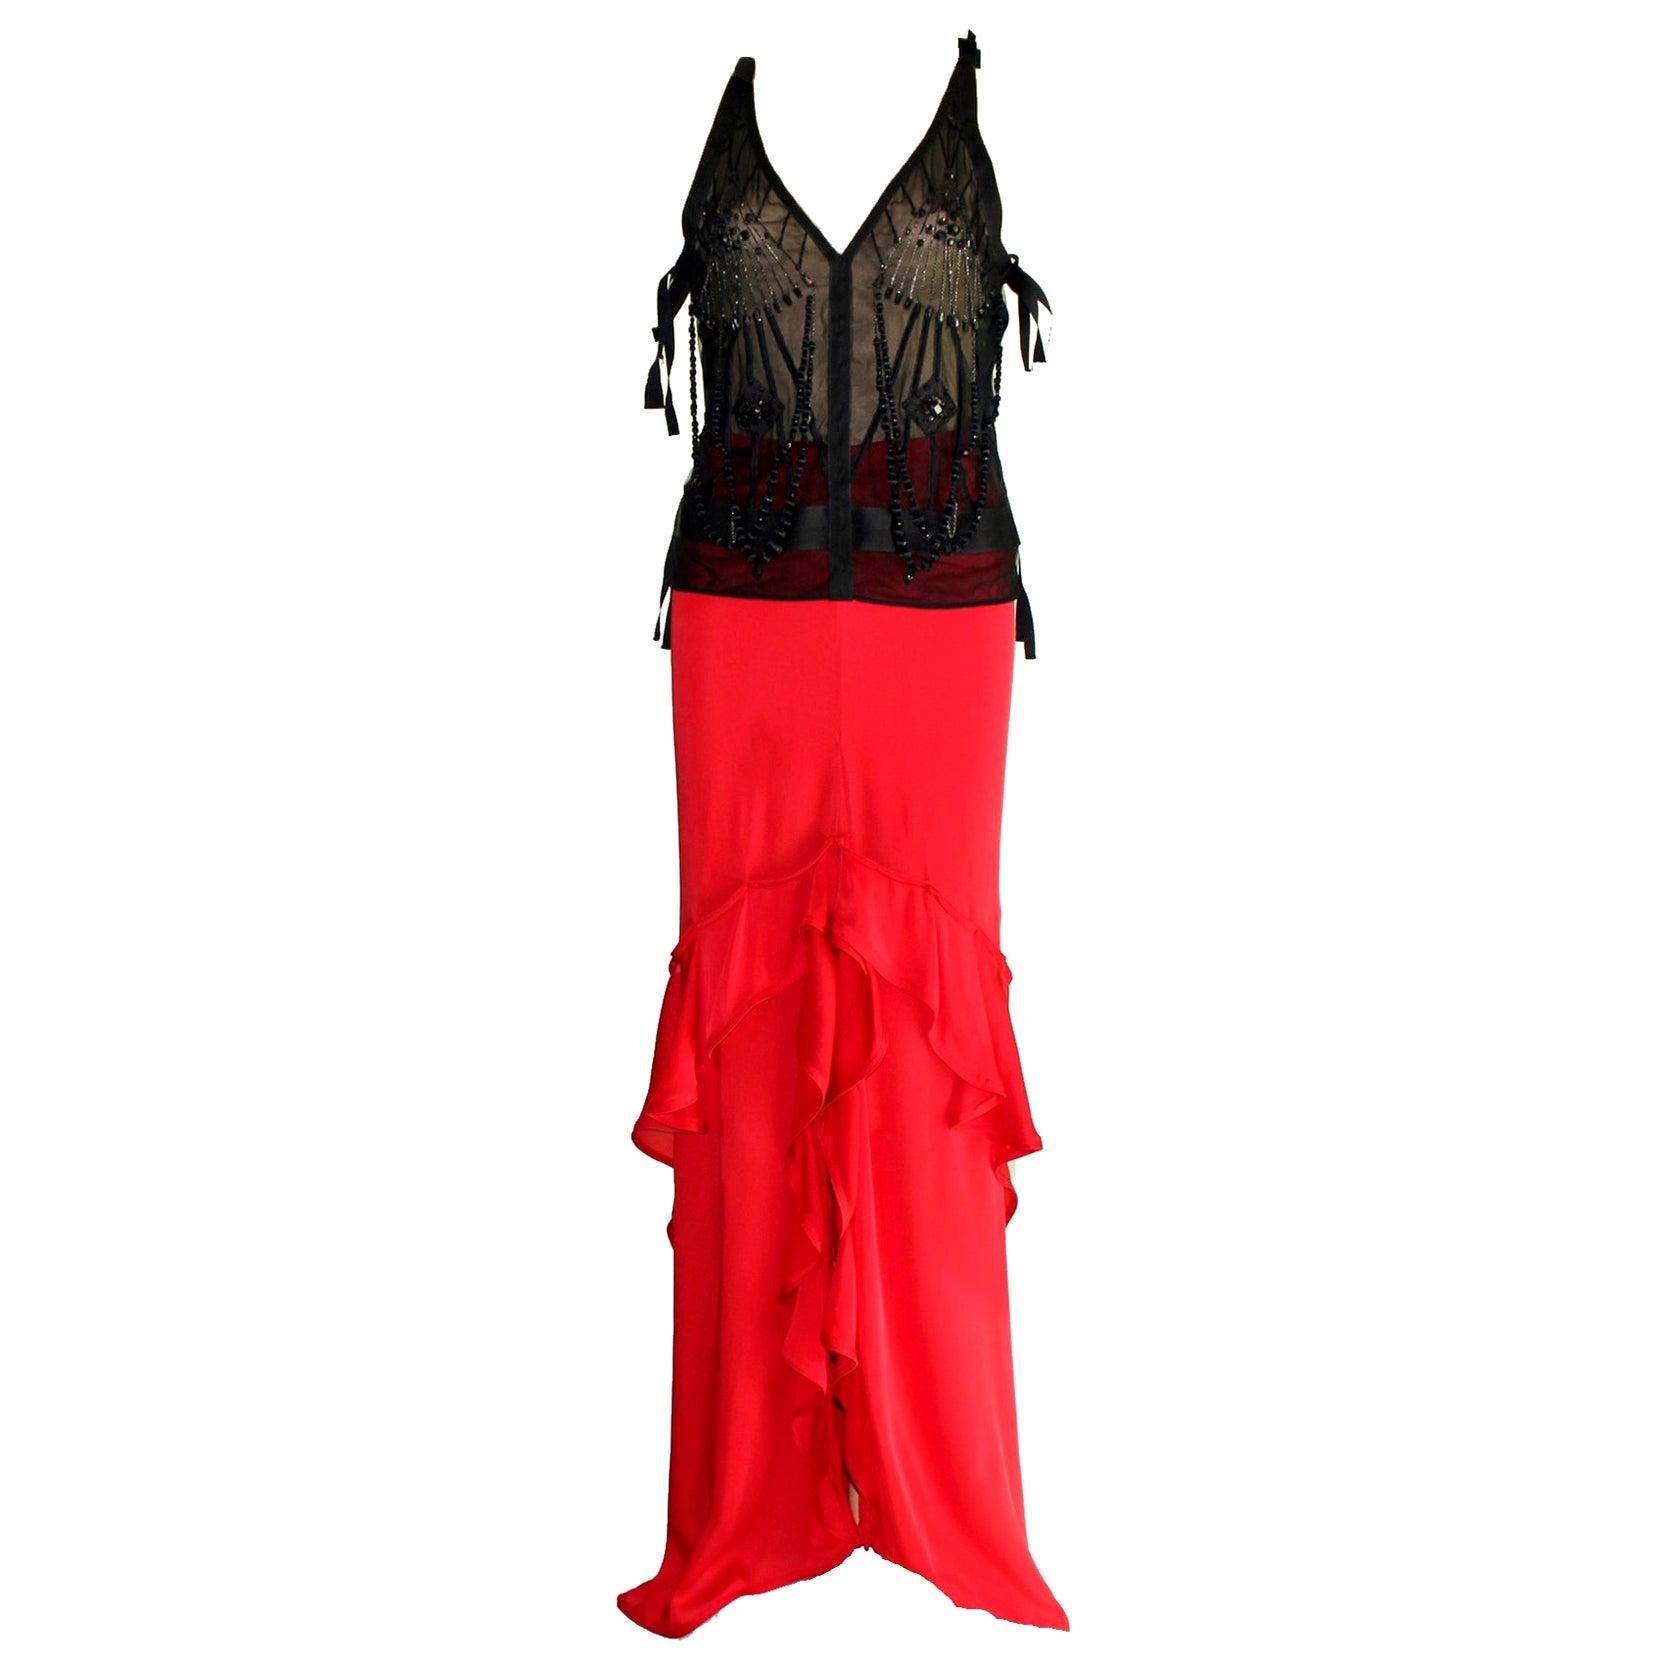 Yves Saint Laurent by Tom Ford Beaded Silk Top and Skirt Ensemble